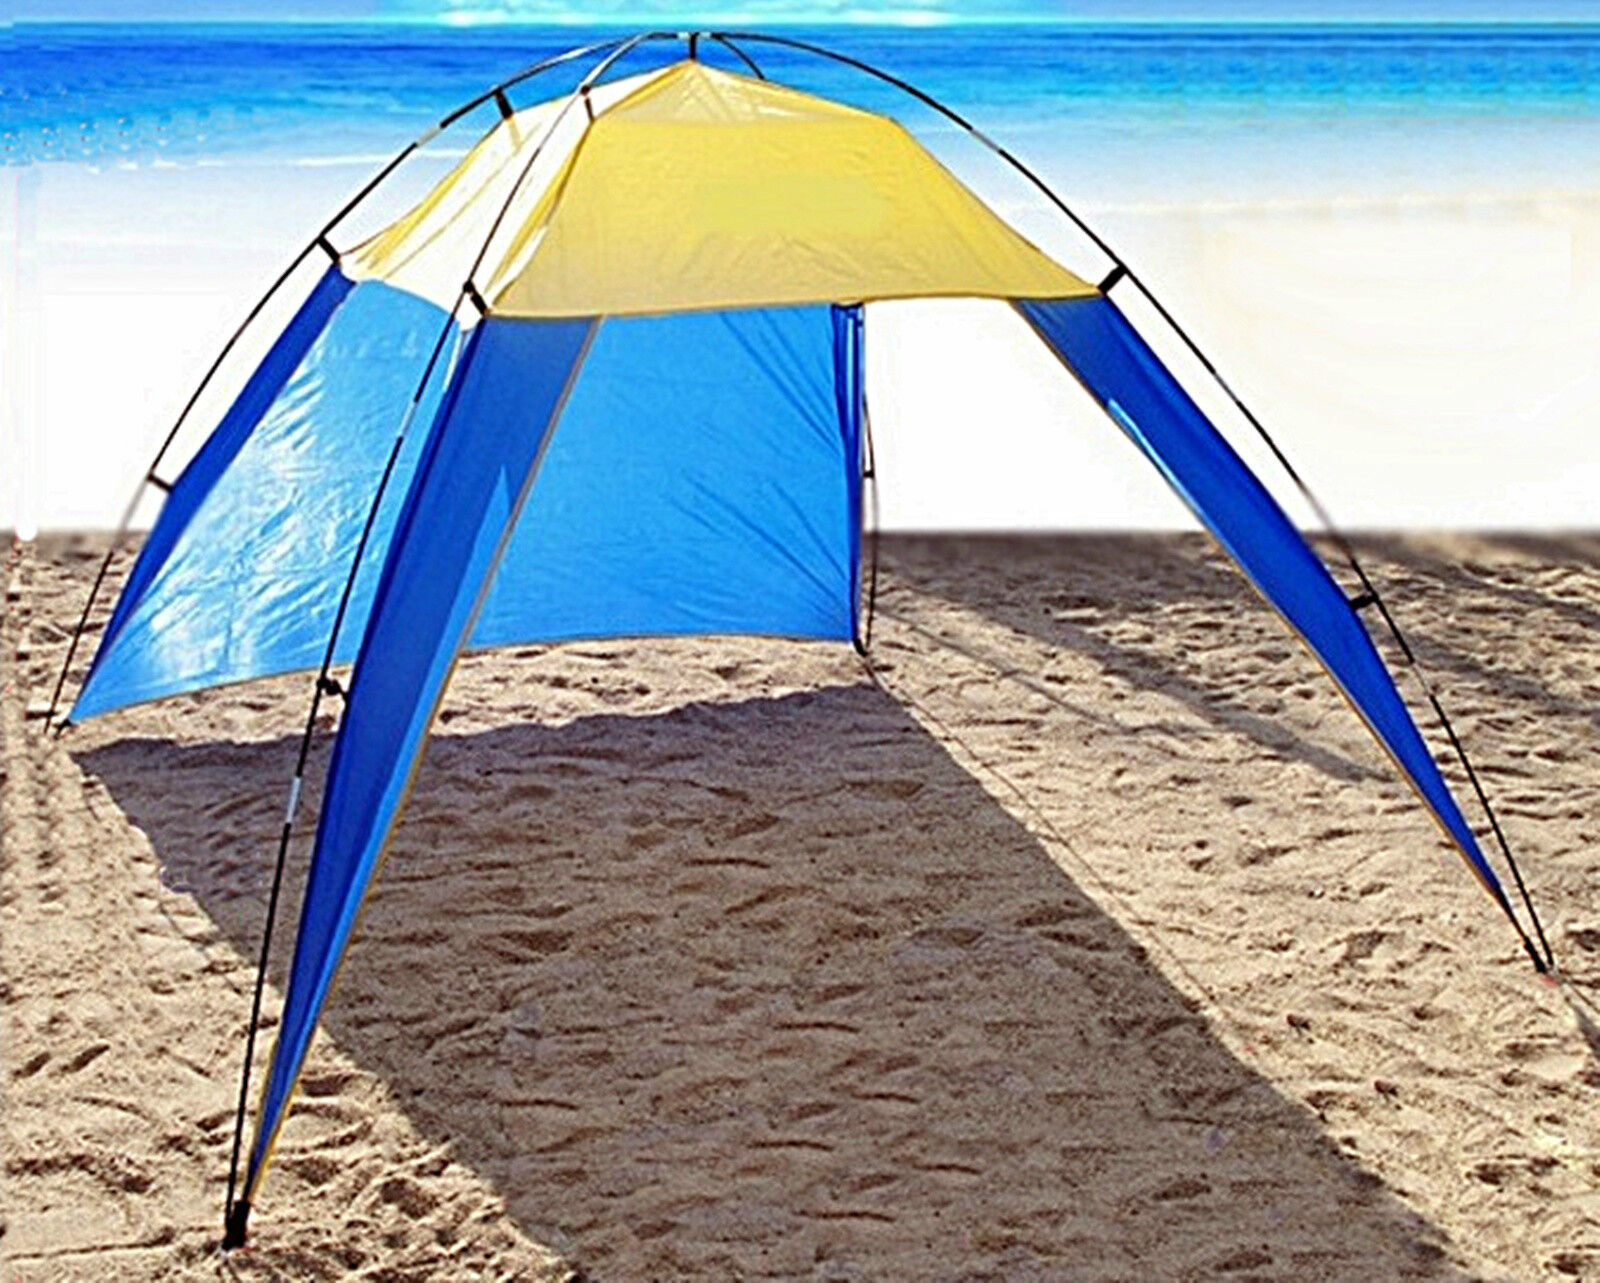 Uv Sun Protective Family Portable Tent Camping Waterproof Beach Shade Outdoor Ebay